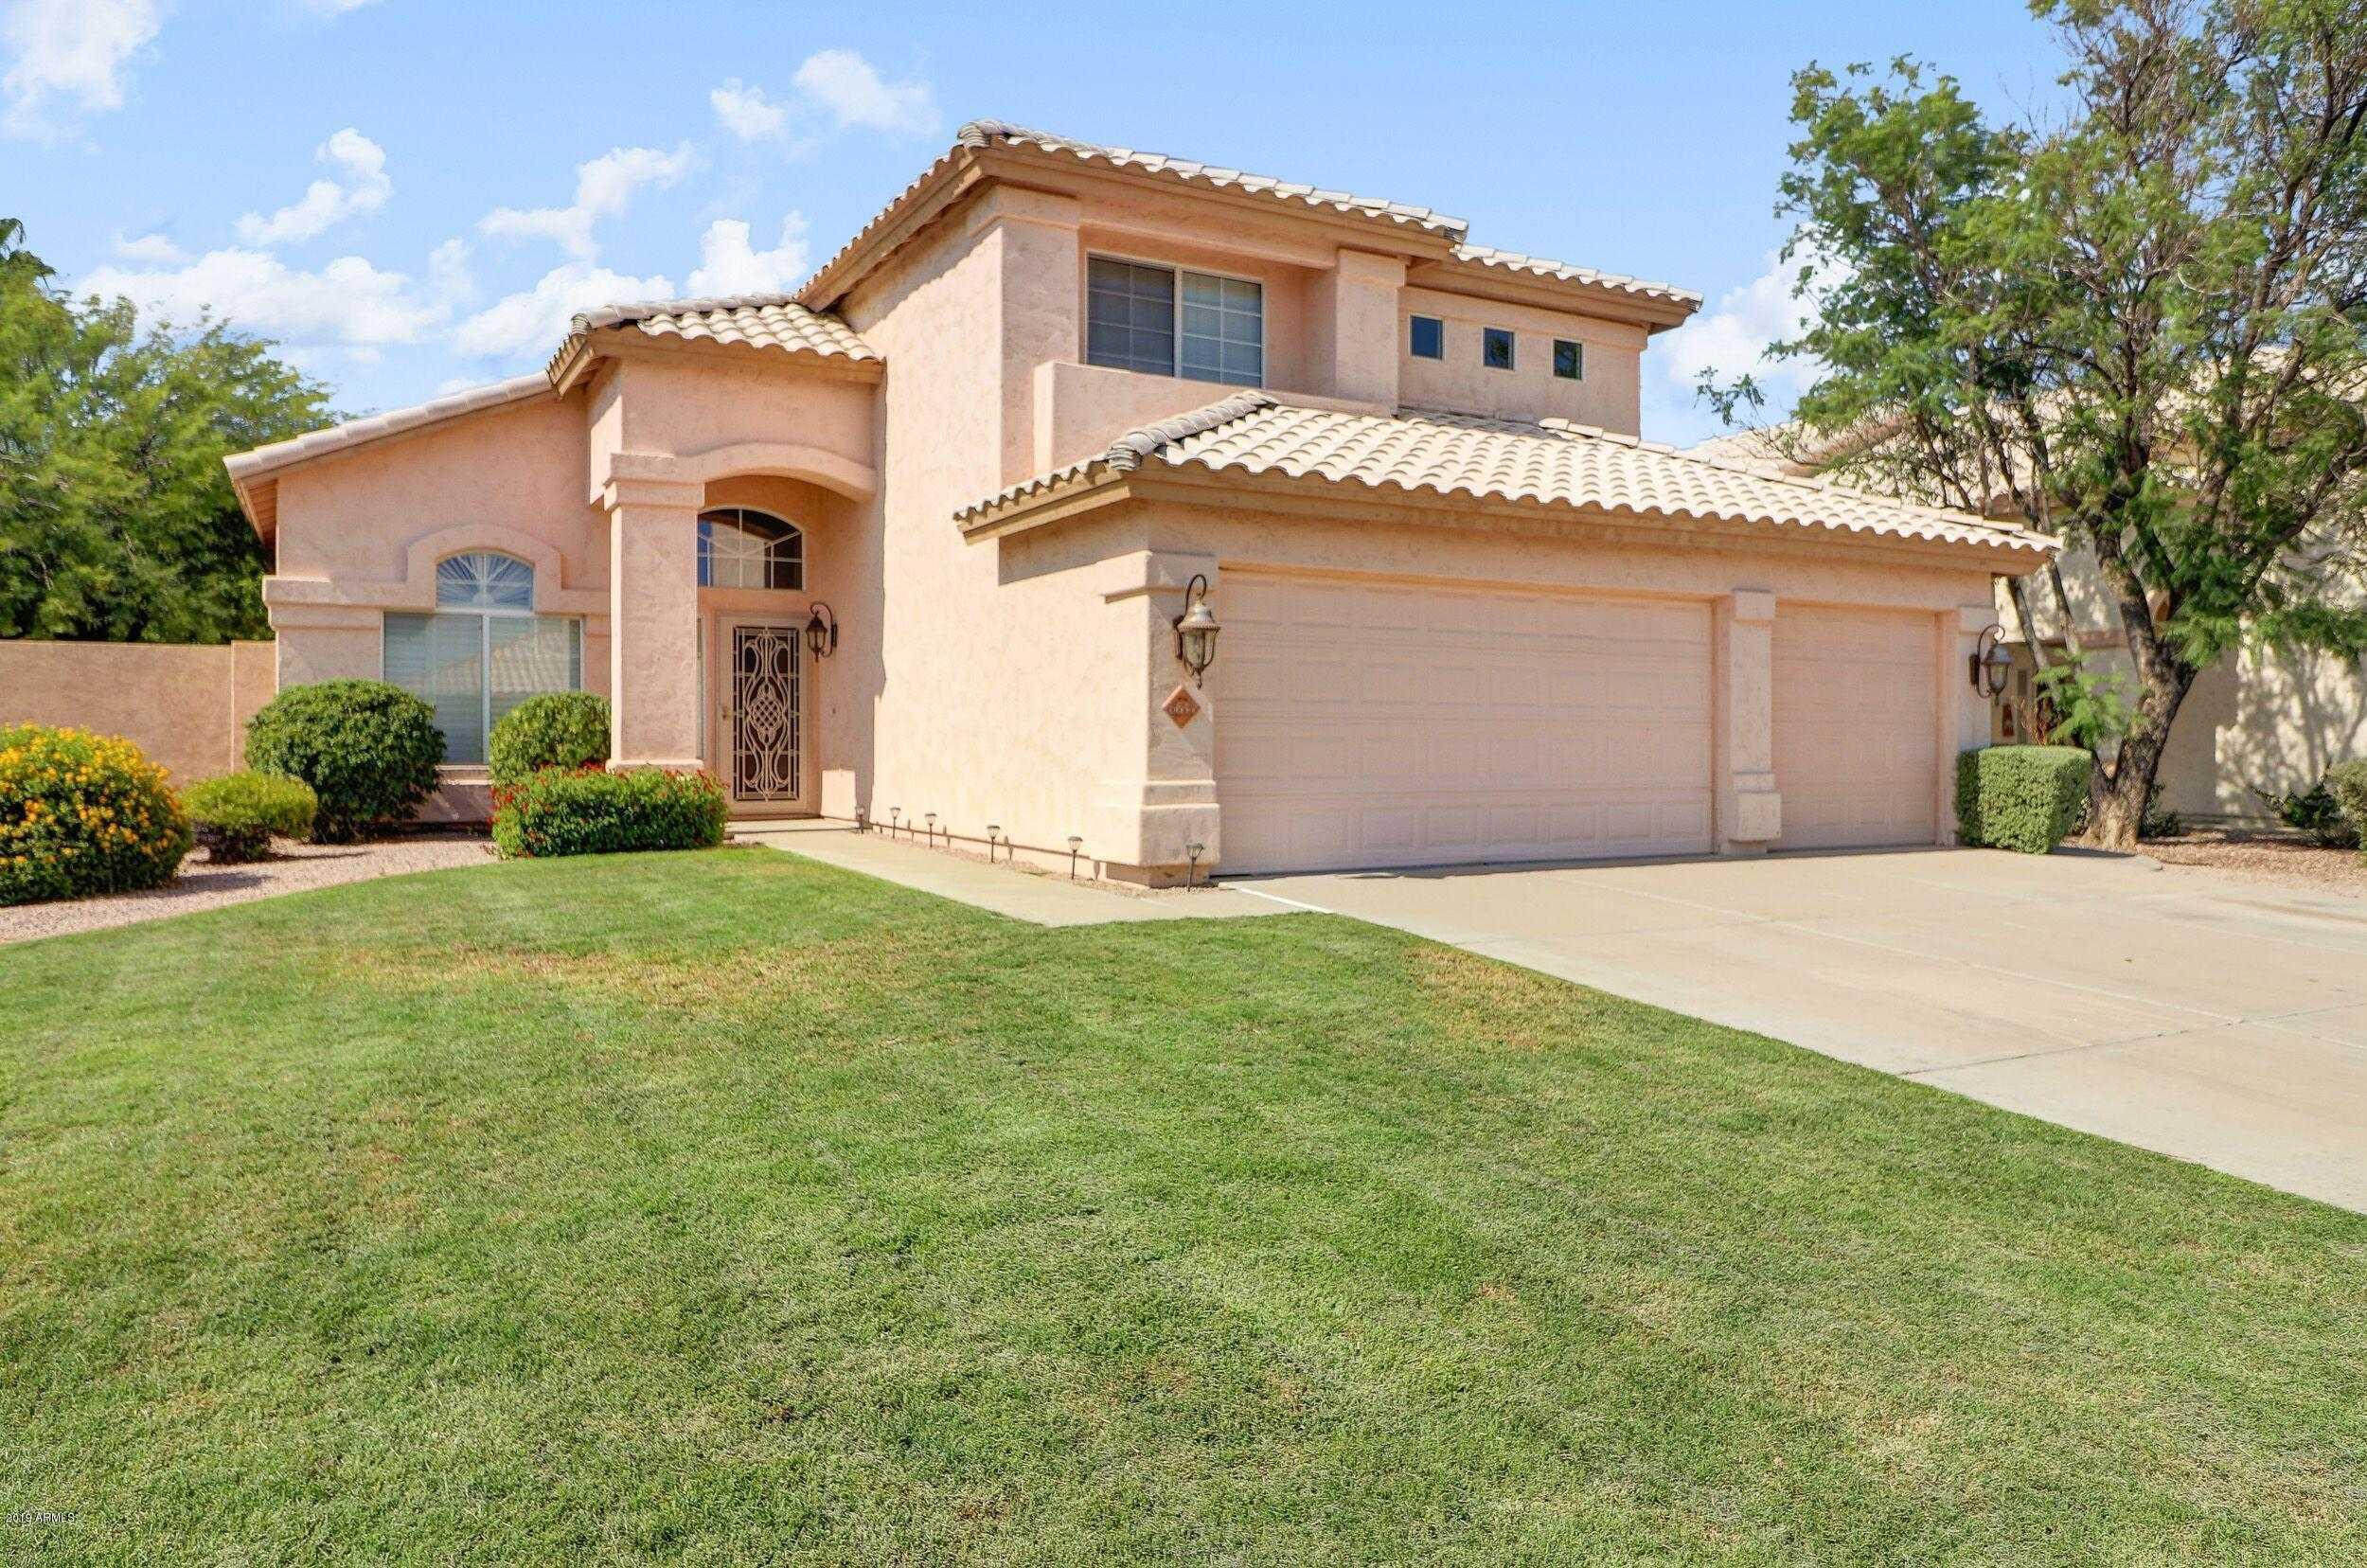 $371,900 - 4Br/3Ba - Home for Sale in Tanoan (arrowhead Ranch), Glendale